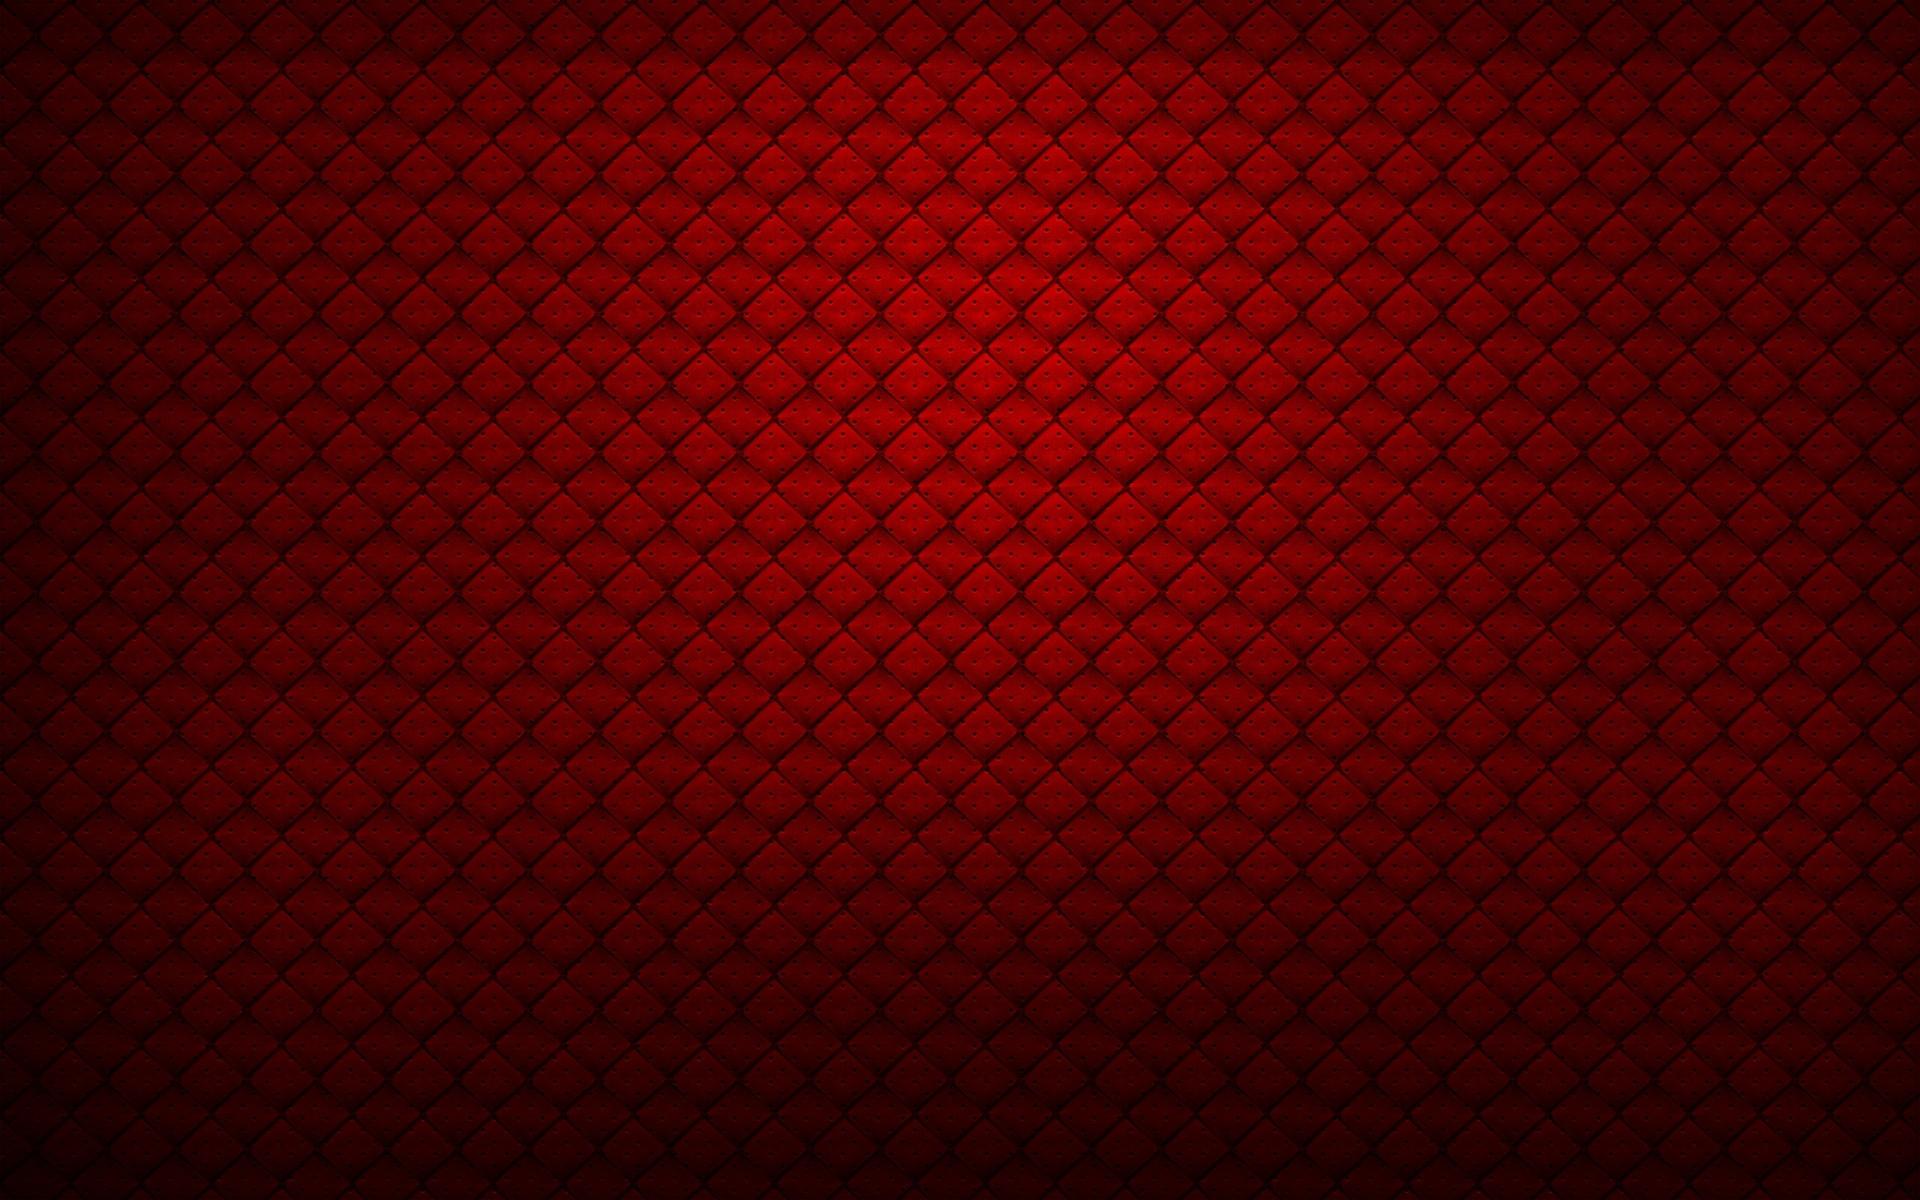 1920x1200 Red tiles desktop PC and Mac wallpaper